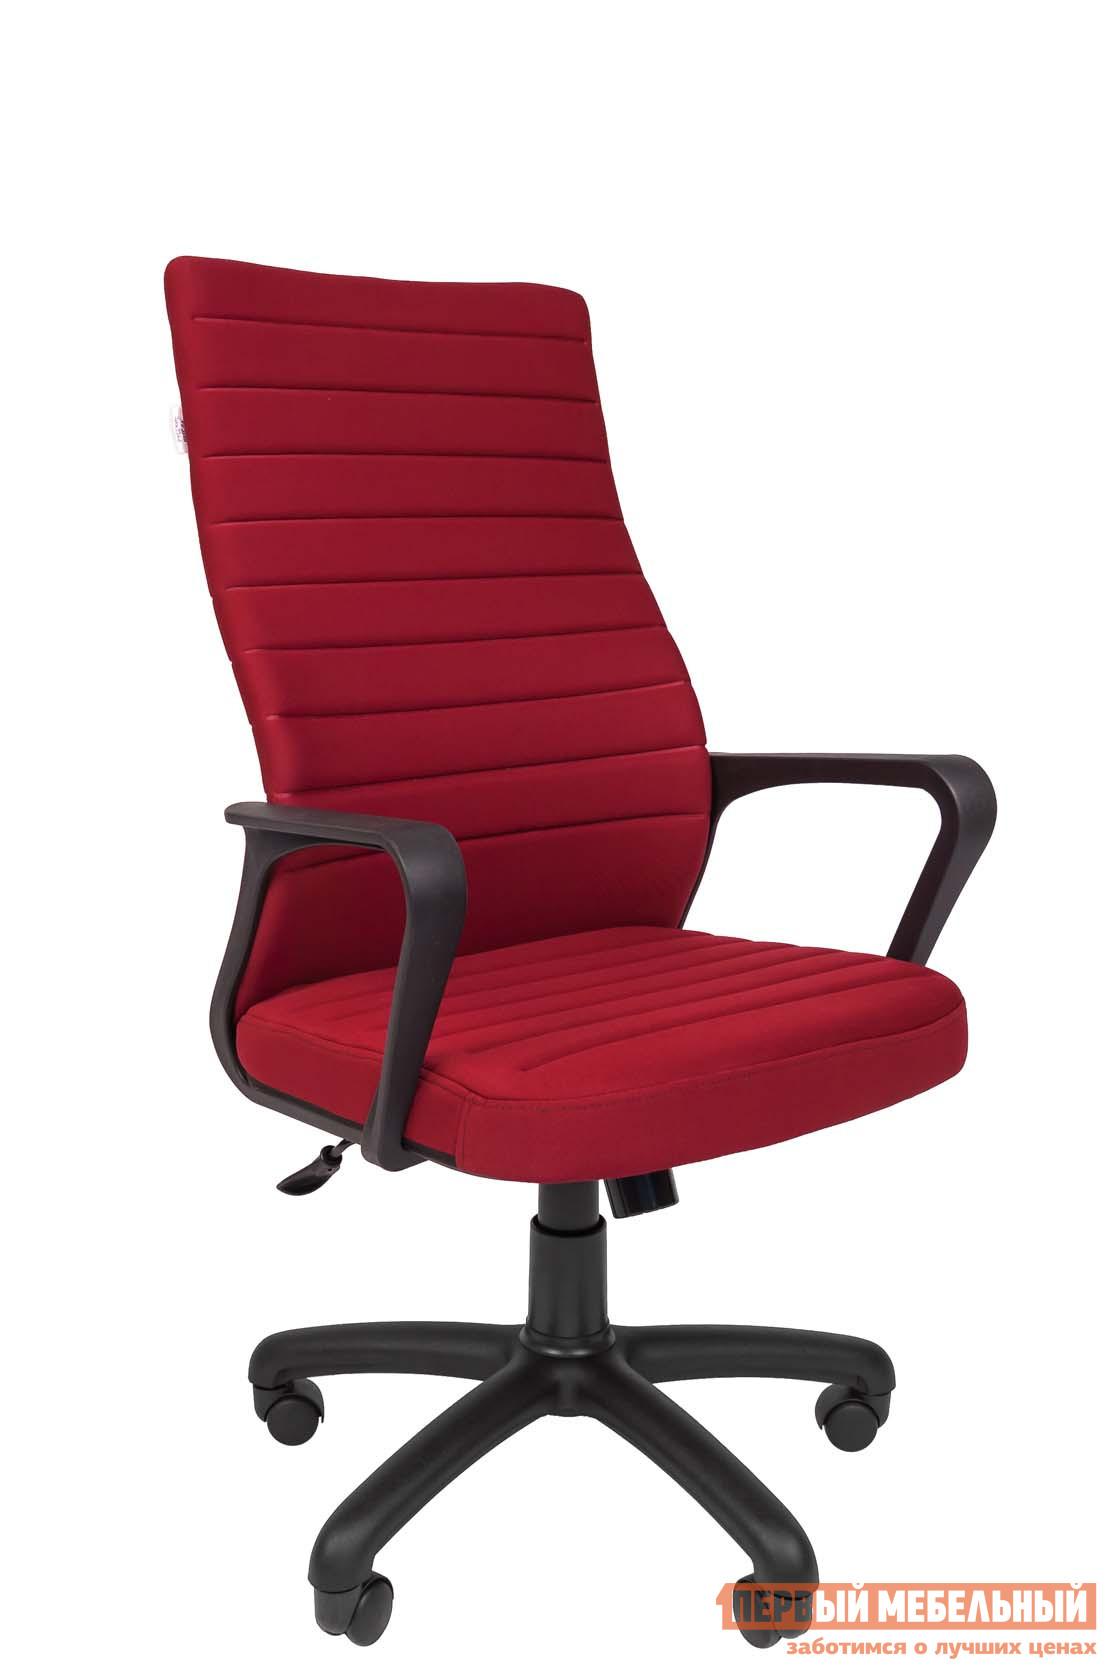 Кресло руководителя Русские кресла РК 165 SY / PK 165 S sweet years sy 6285l 13